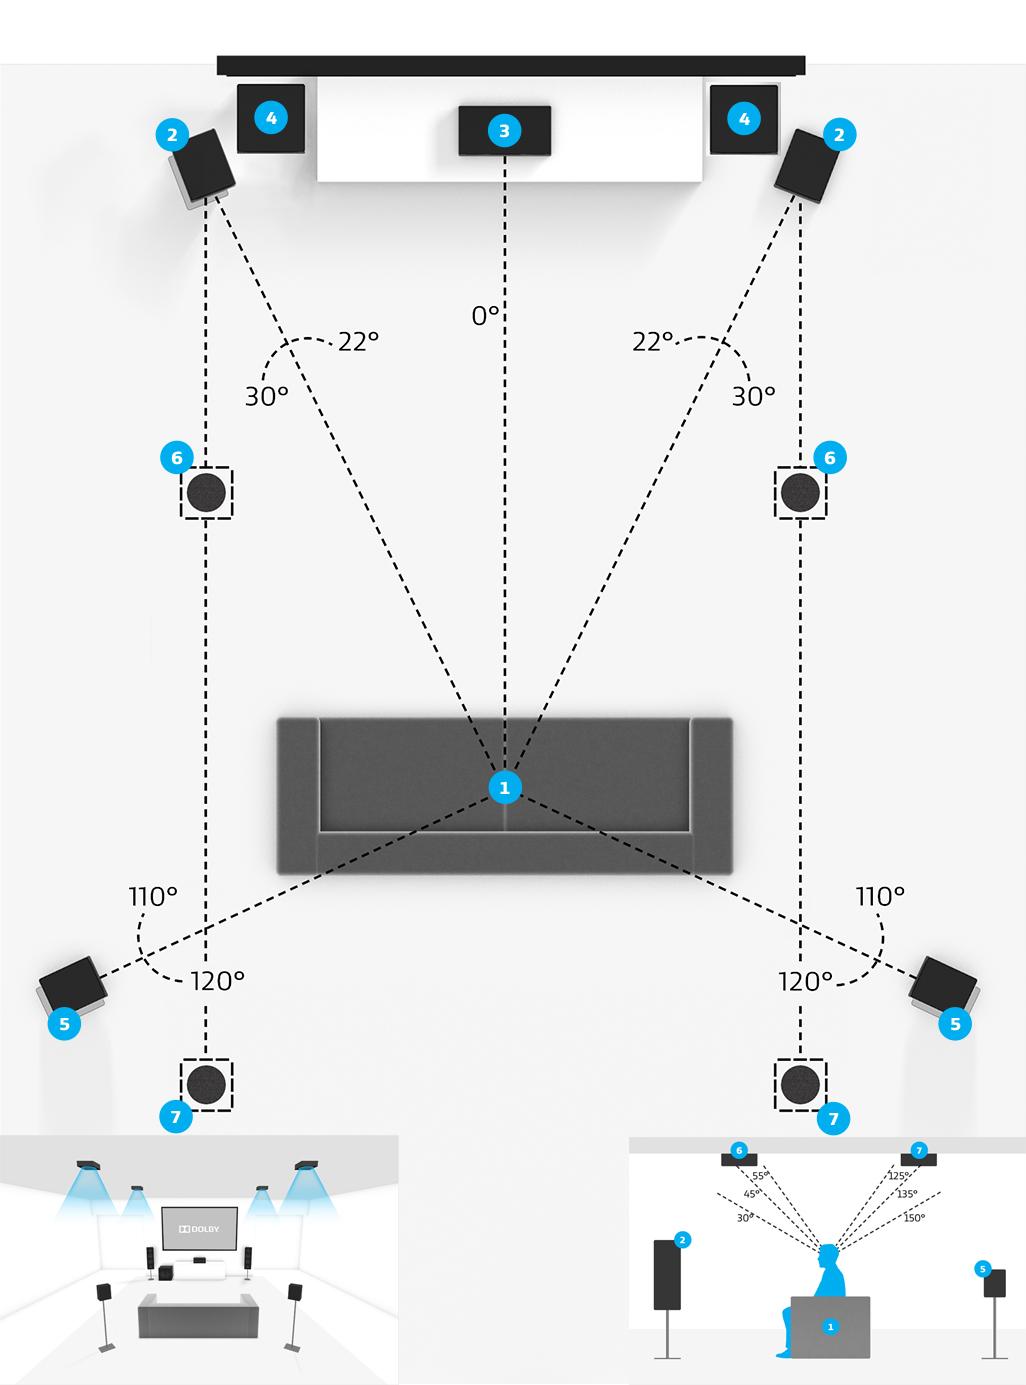 5.2.4 Speaker Placement